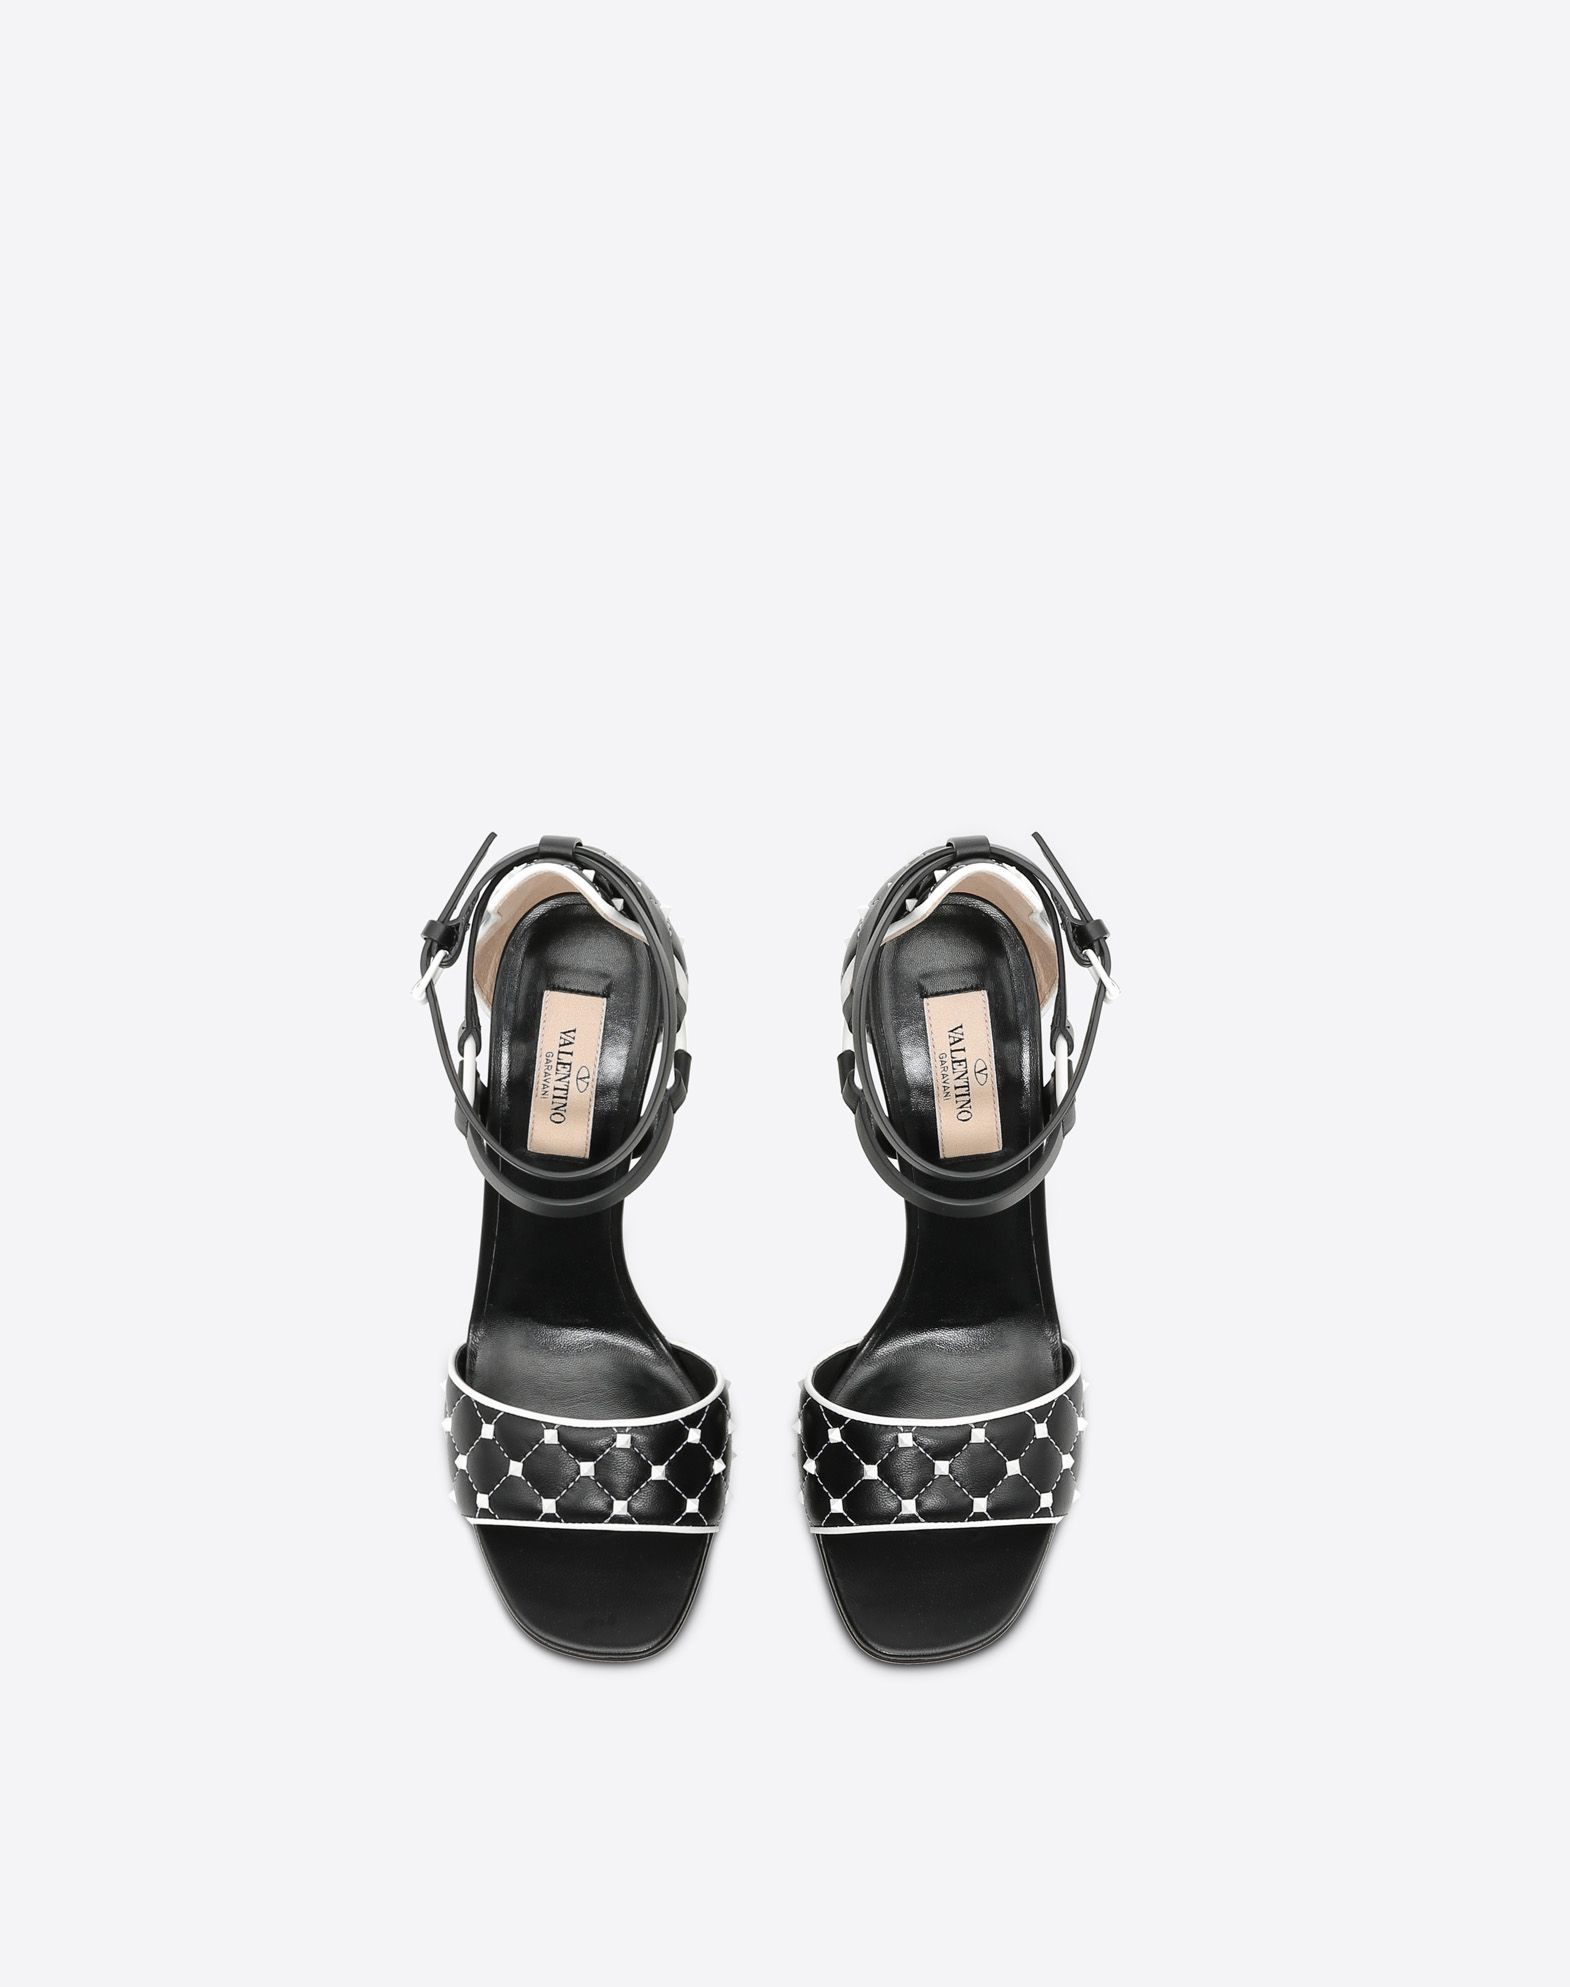 VALENTINO GARAVANI Free Rockstud Spike 凉鞋 SANDALS TACCO ALTO D e